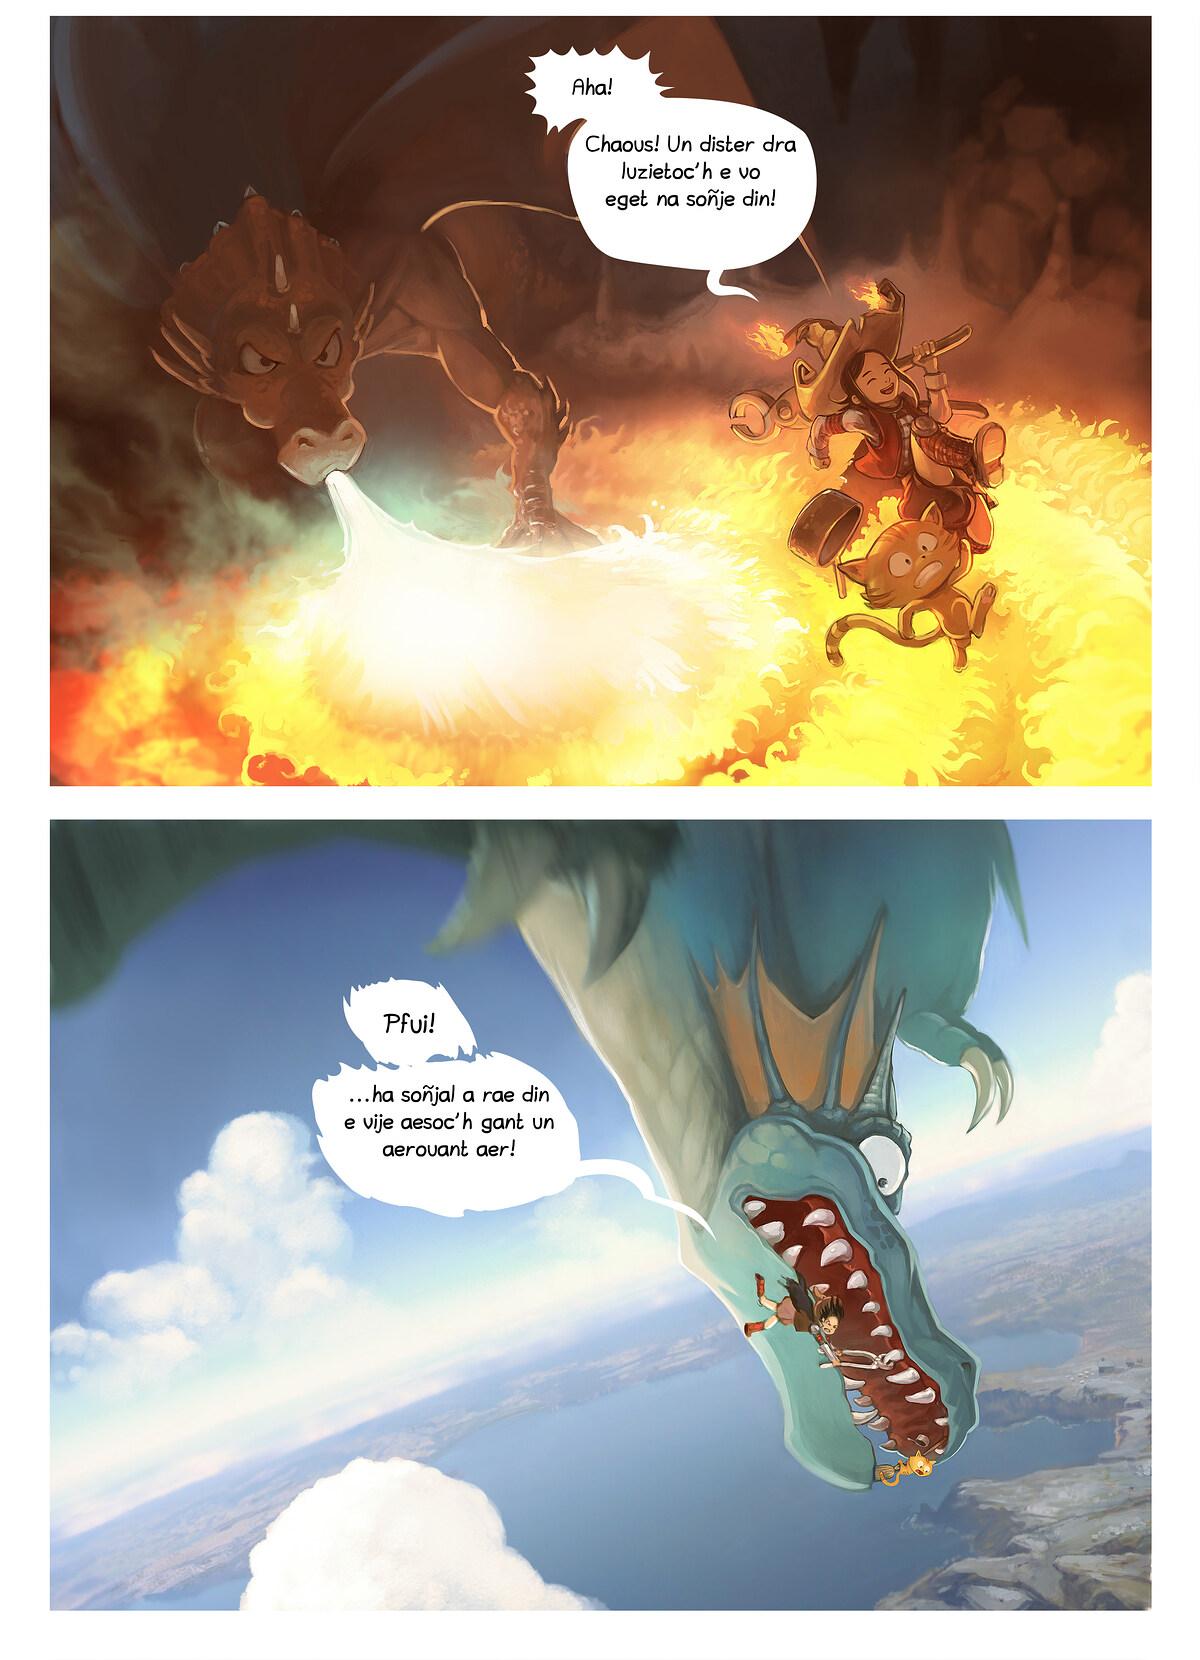 A webcomic page of Pepper&Carrot, rann 14 [br], pajenn 3